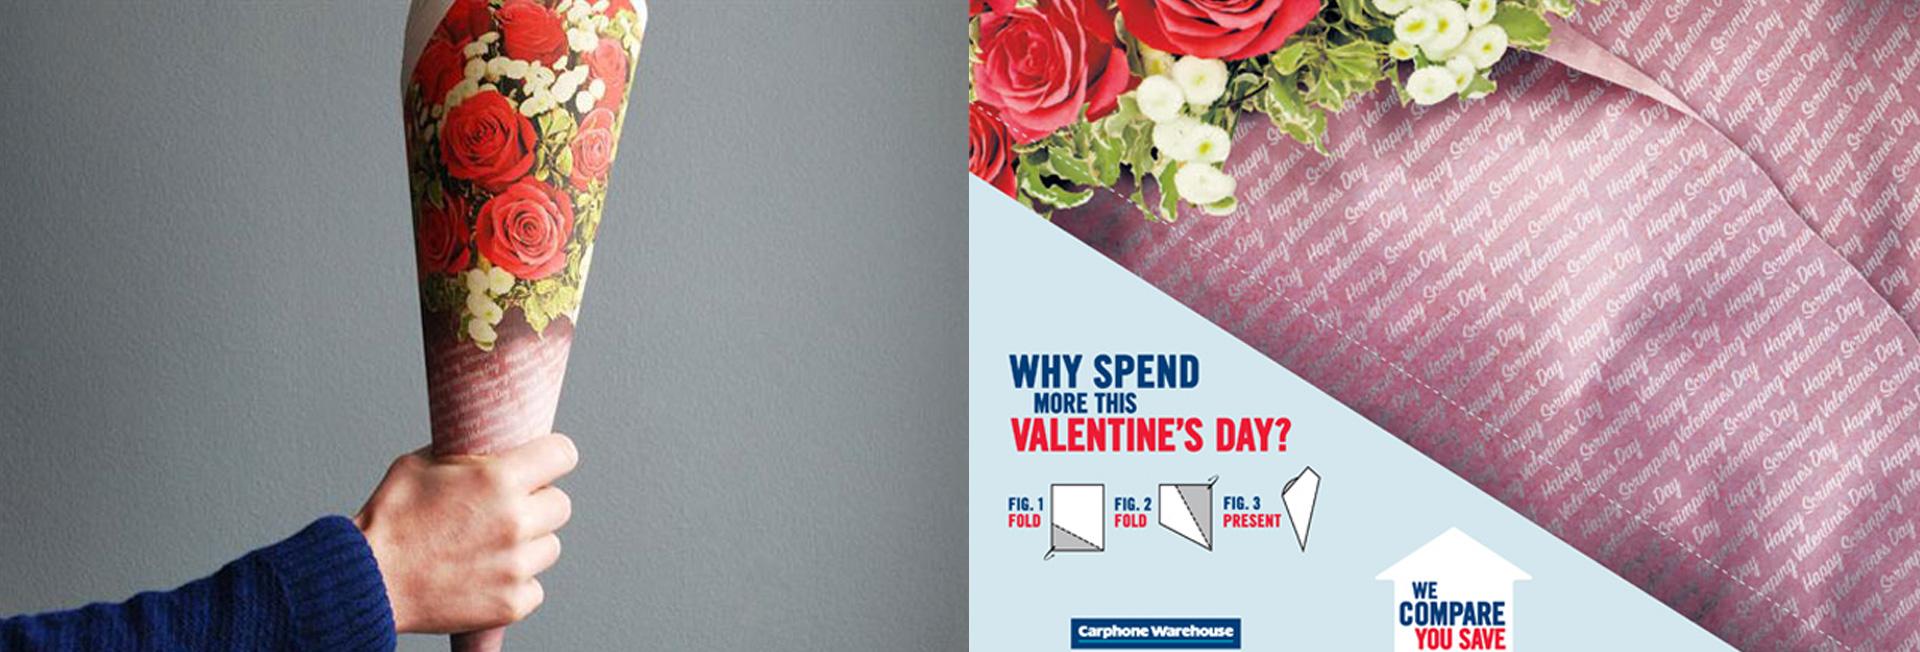 Carphone Warehouse Valentines